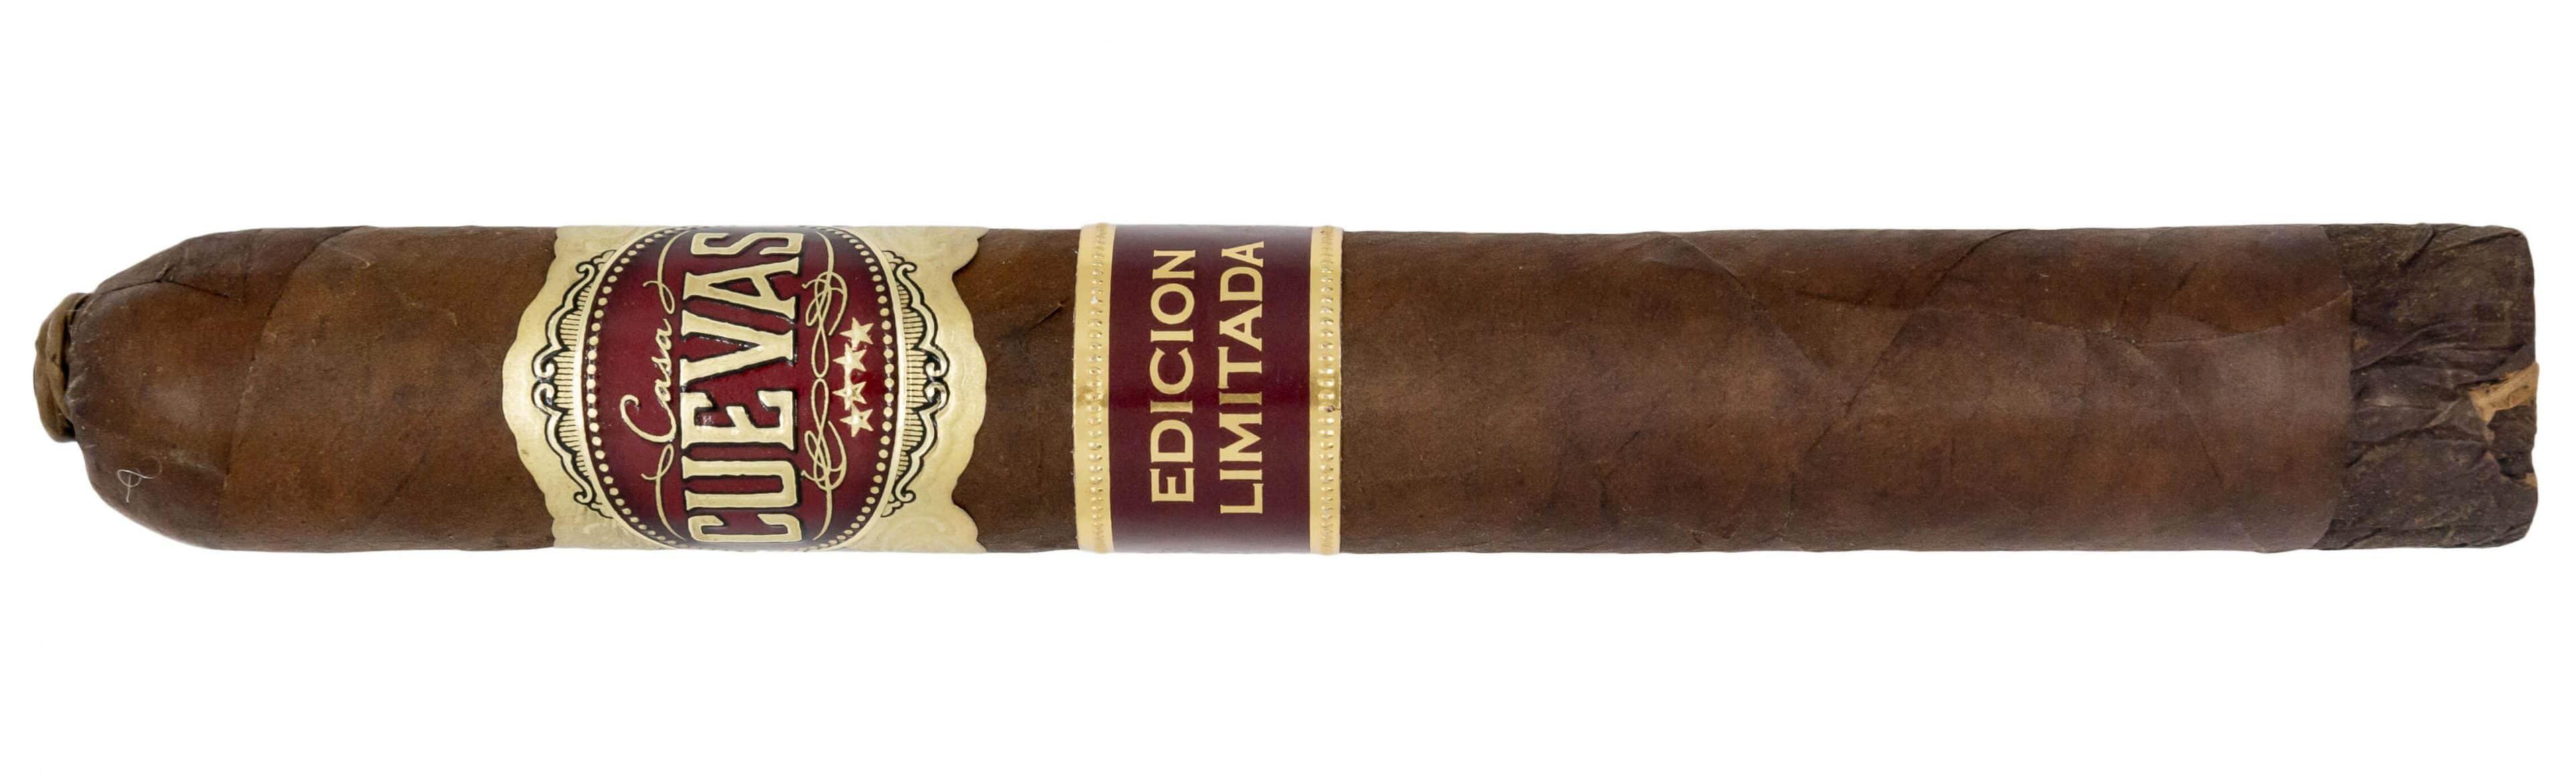 Blind Cigar Review: Casa Cuevas   La Mandarria